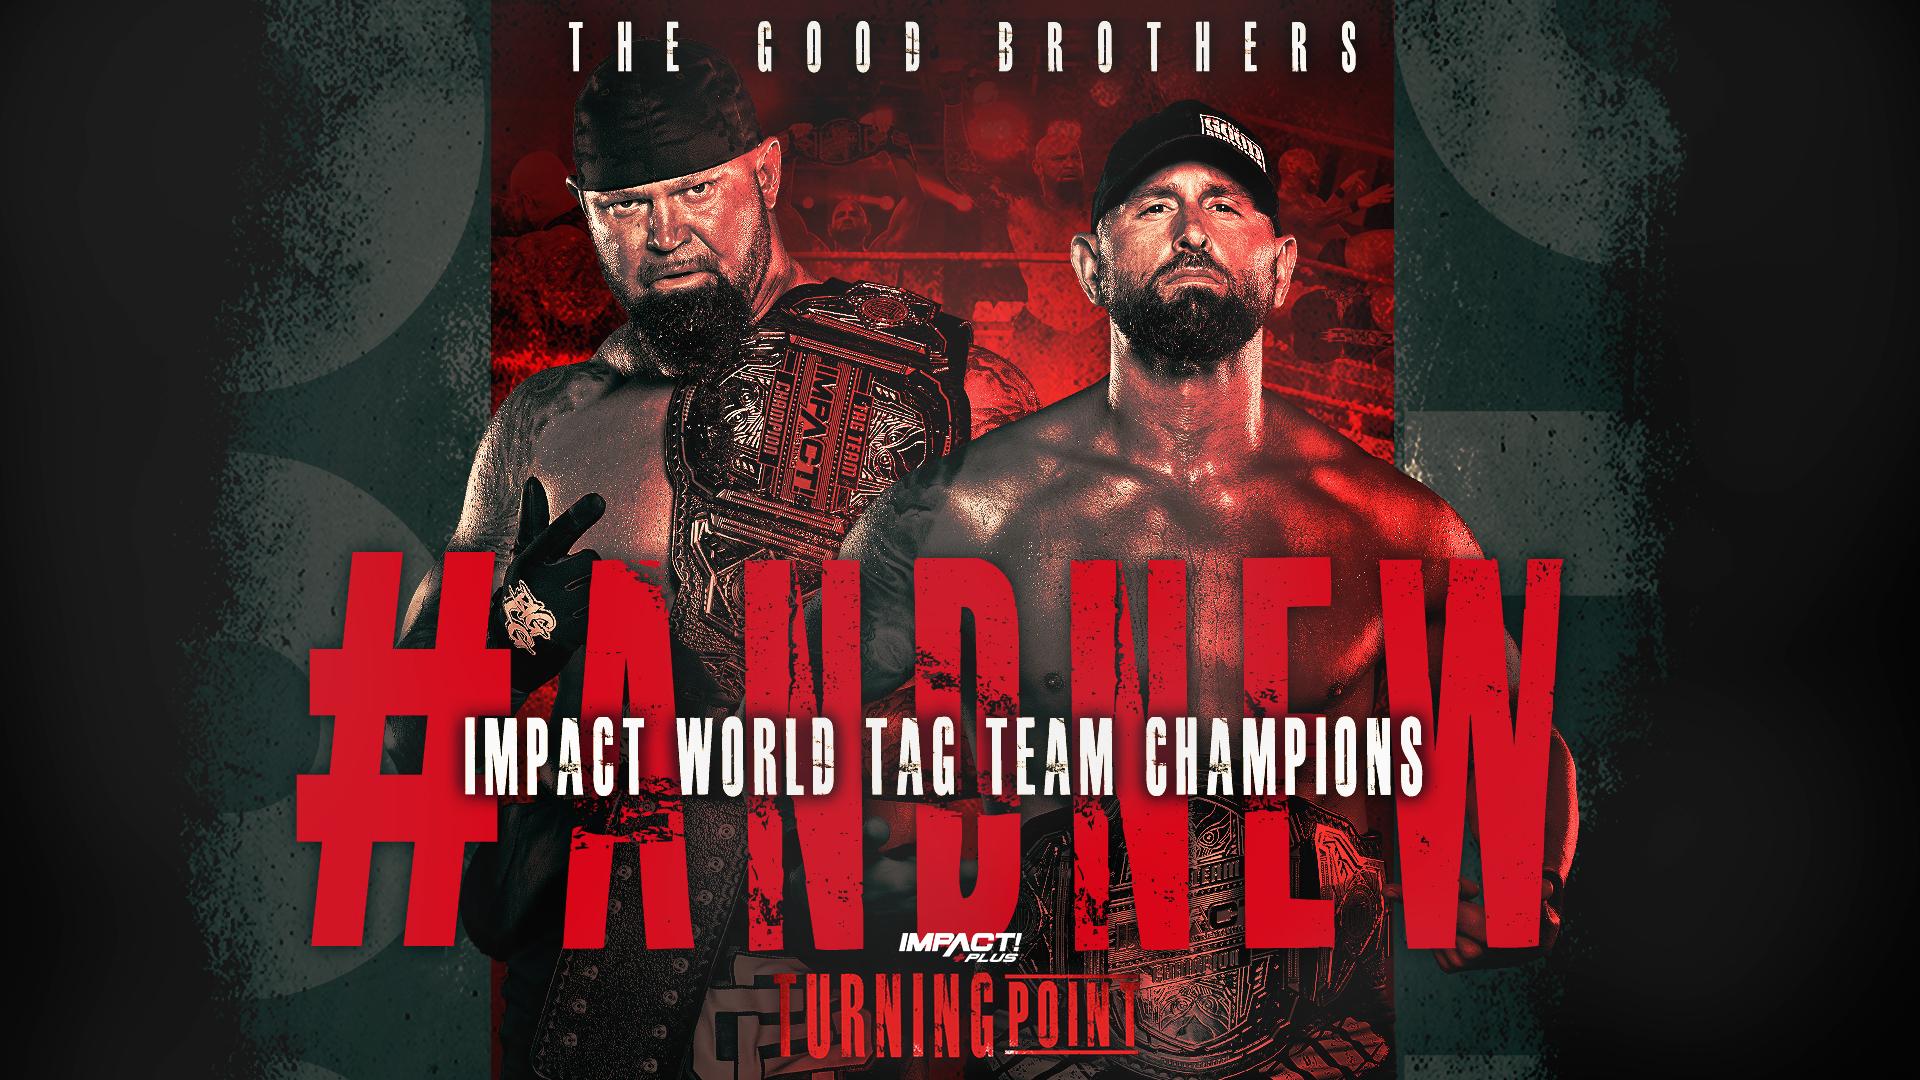 Karl Anderson e DOC Gallows conquistam o IMPACT World Tag Team Championship